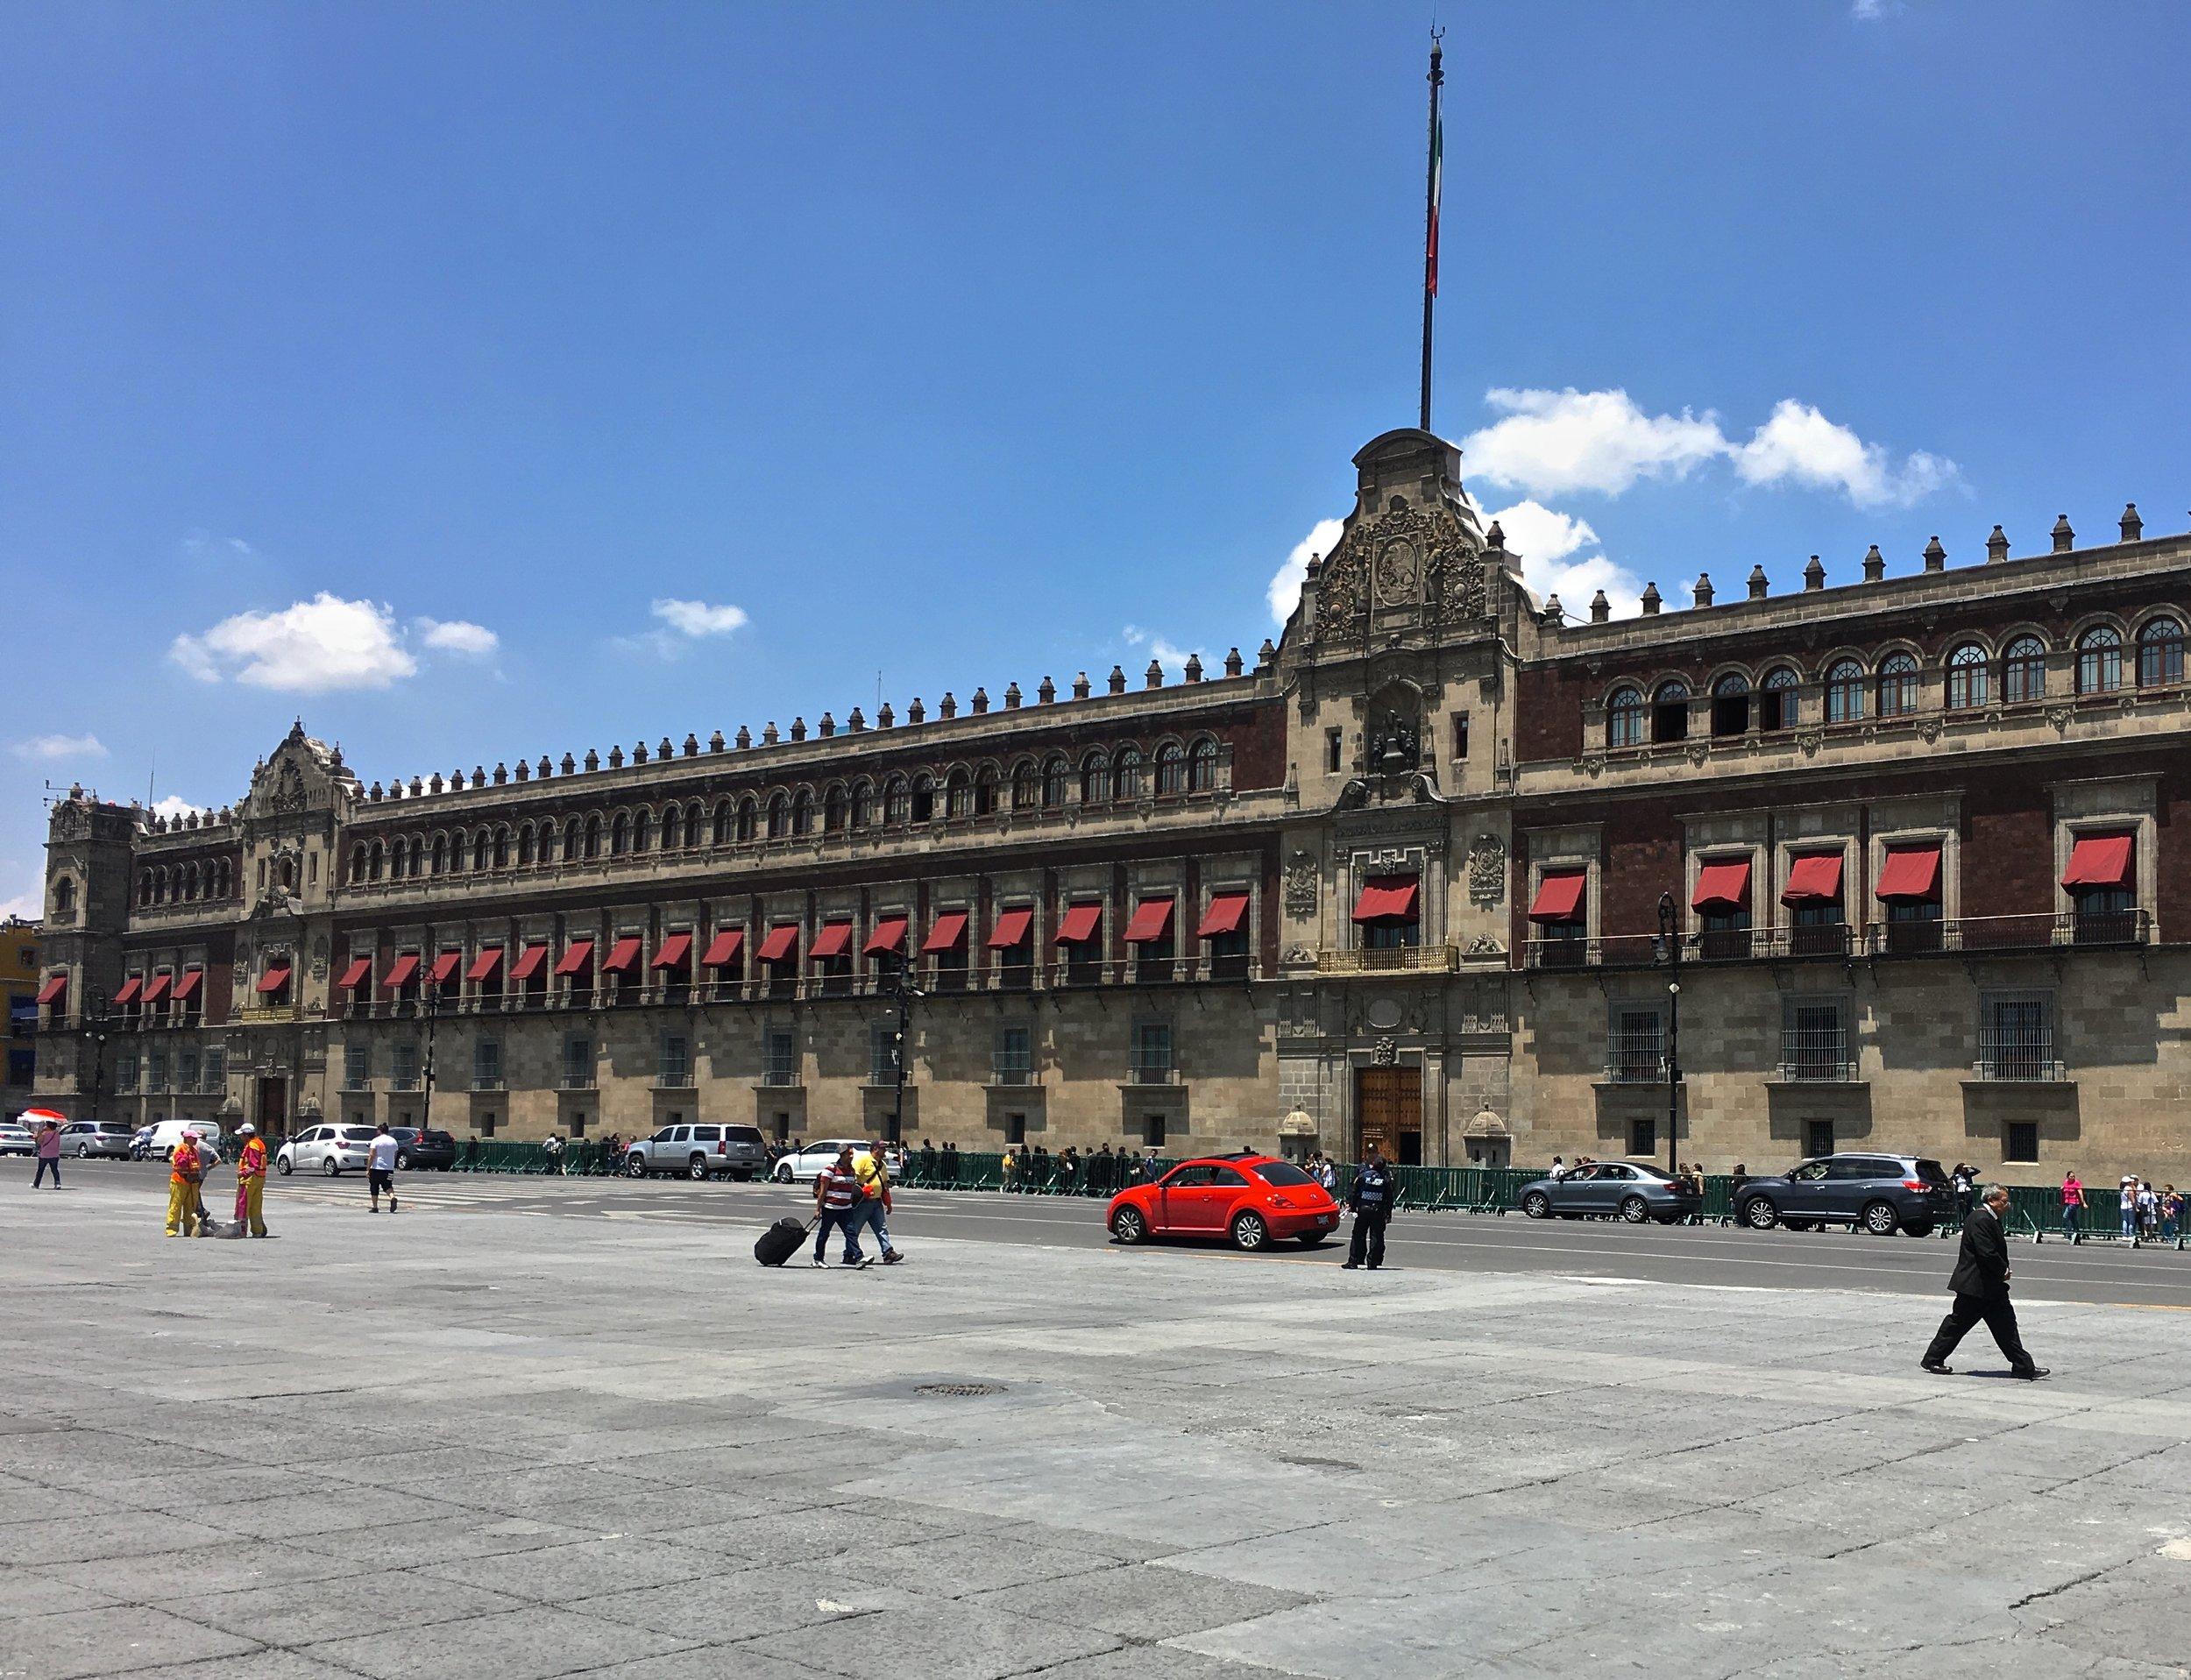 Facade of the Mexico National Palace